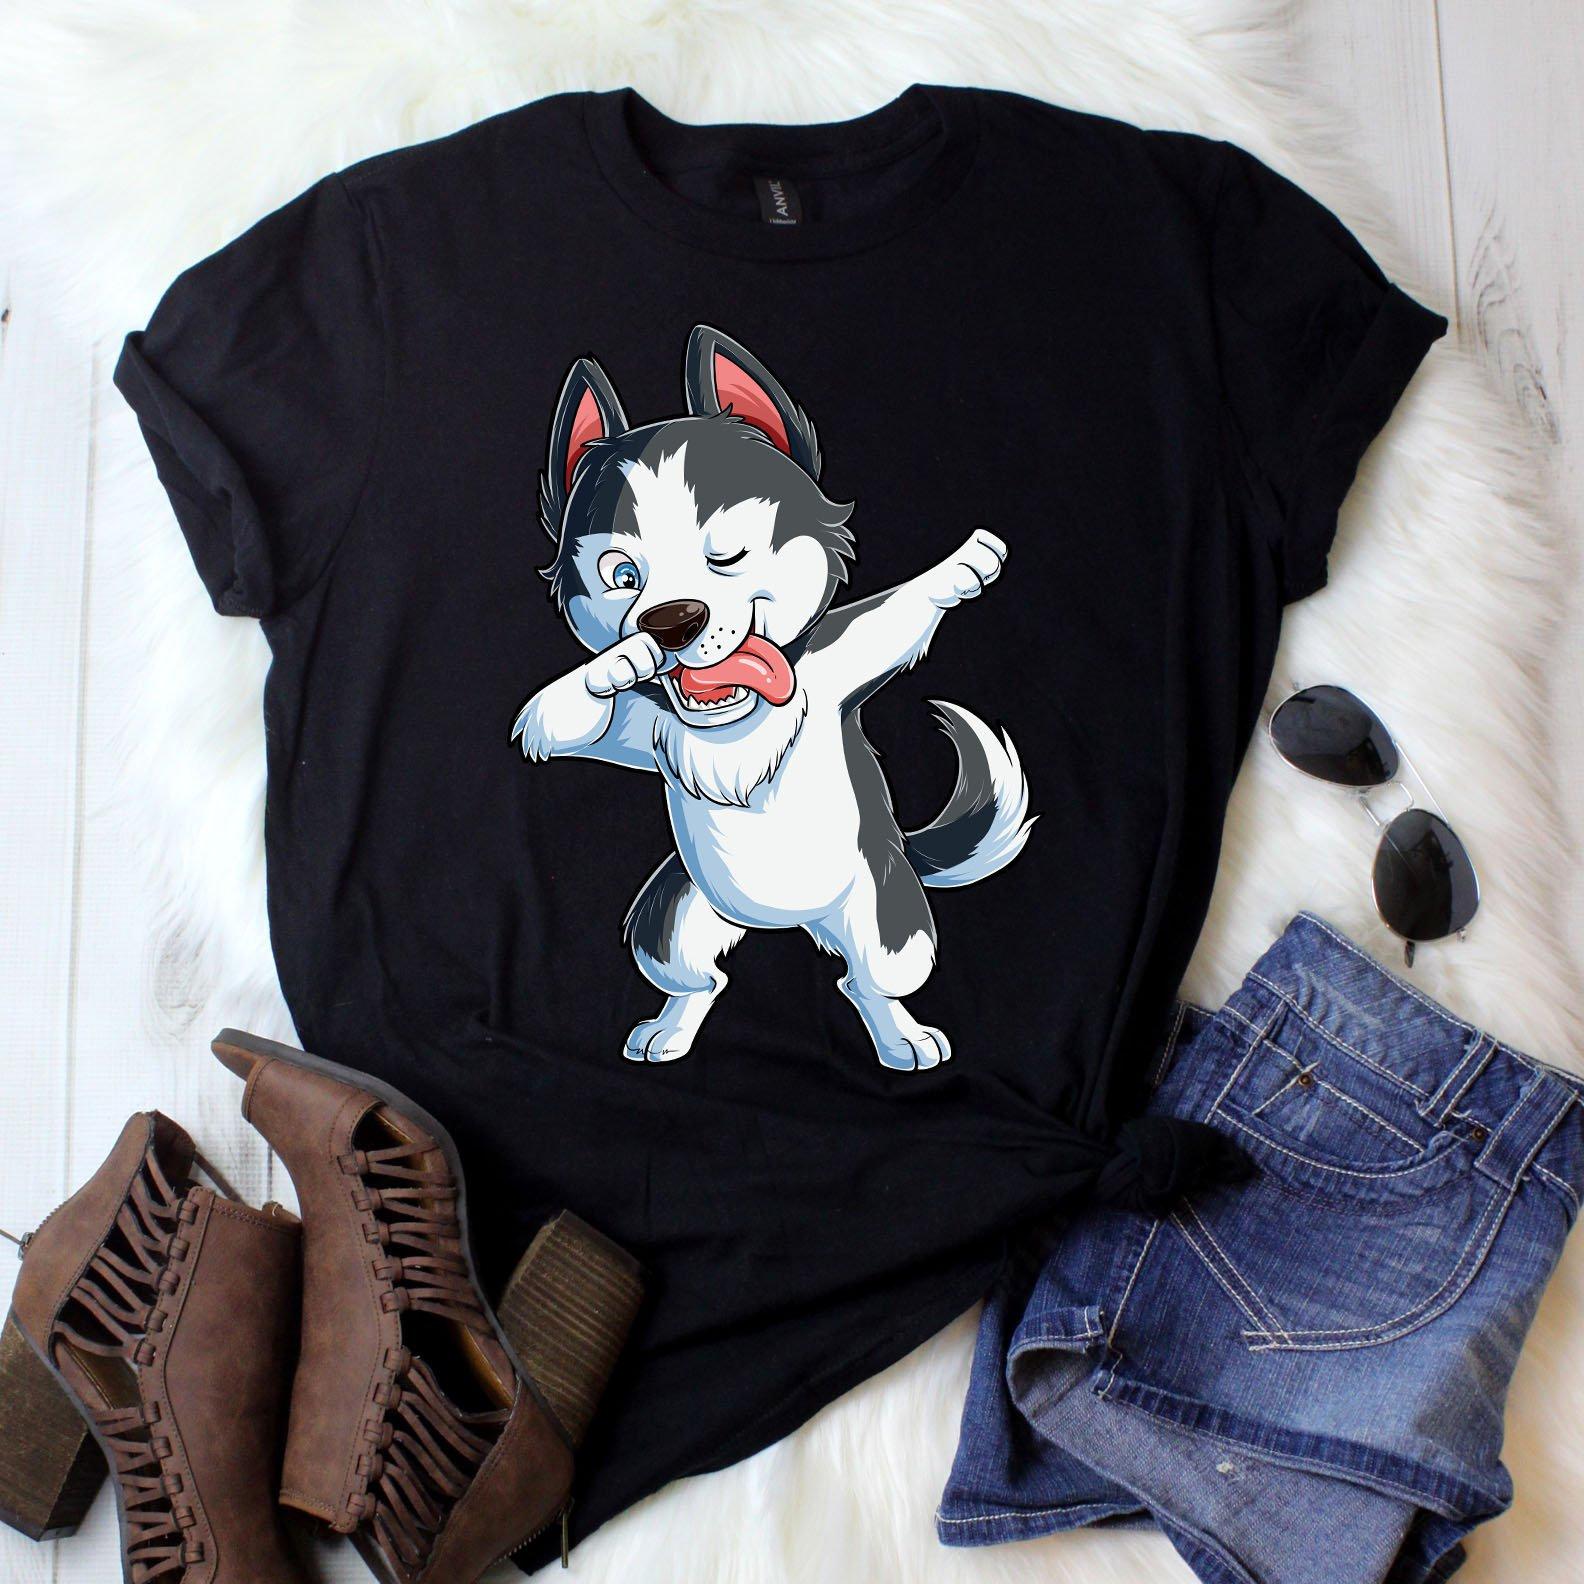 Avec Husky T shirt garçons filles hommes femmes enfants enfants femmes chien Dab danse drôle Tee / Mens Tank / débardeur nageur / sweat / Hoodie ebe7af